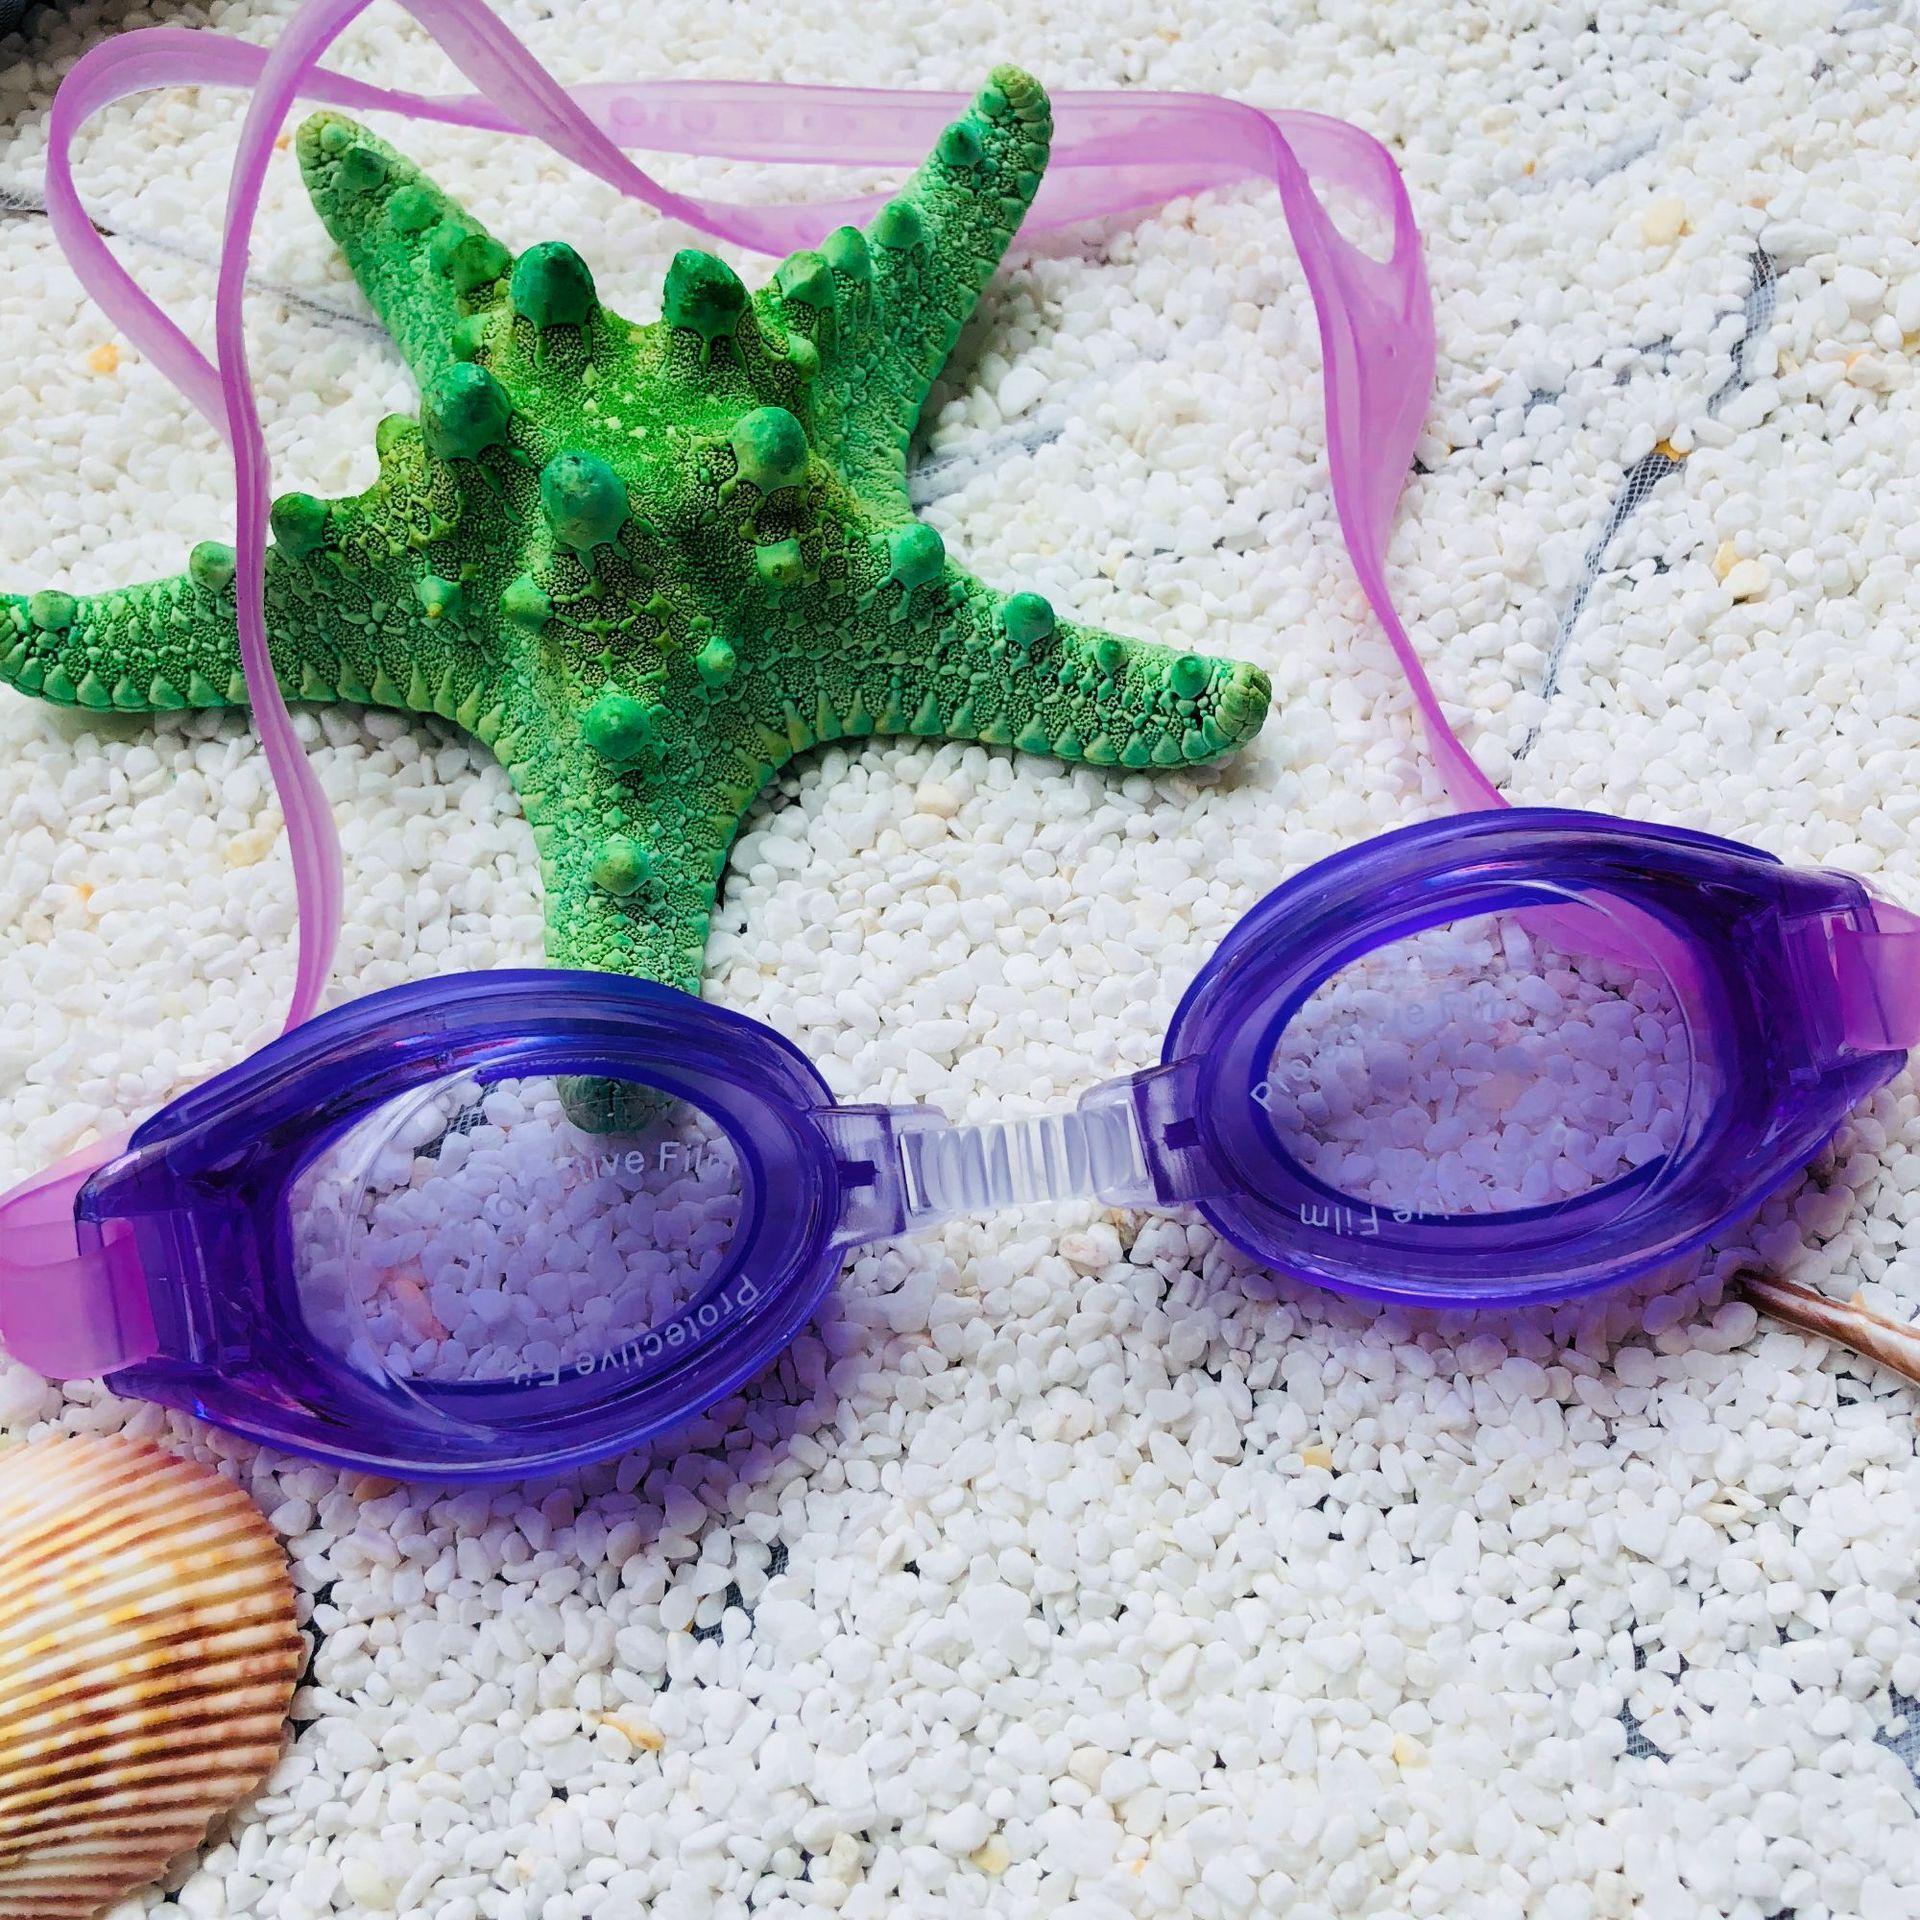 Outdoor Water Sports Swimming Glasses Goggles Underwater Diving Eyeglasses Eyewear Swimwear For Men Women Children w/ Clear Case